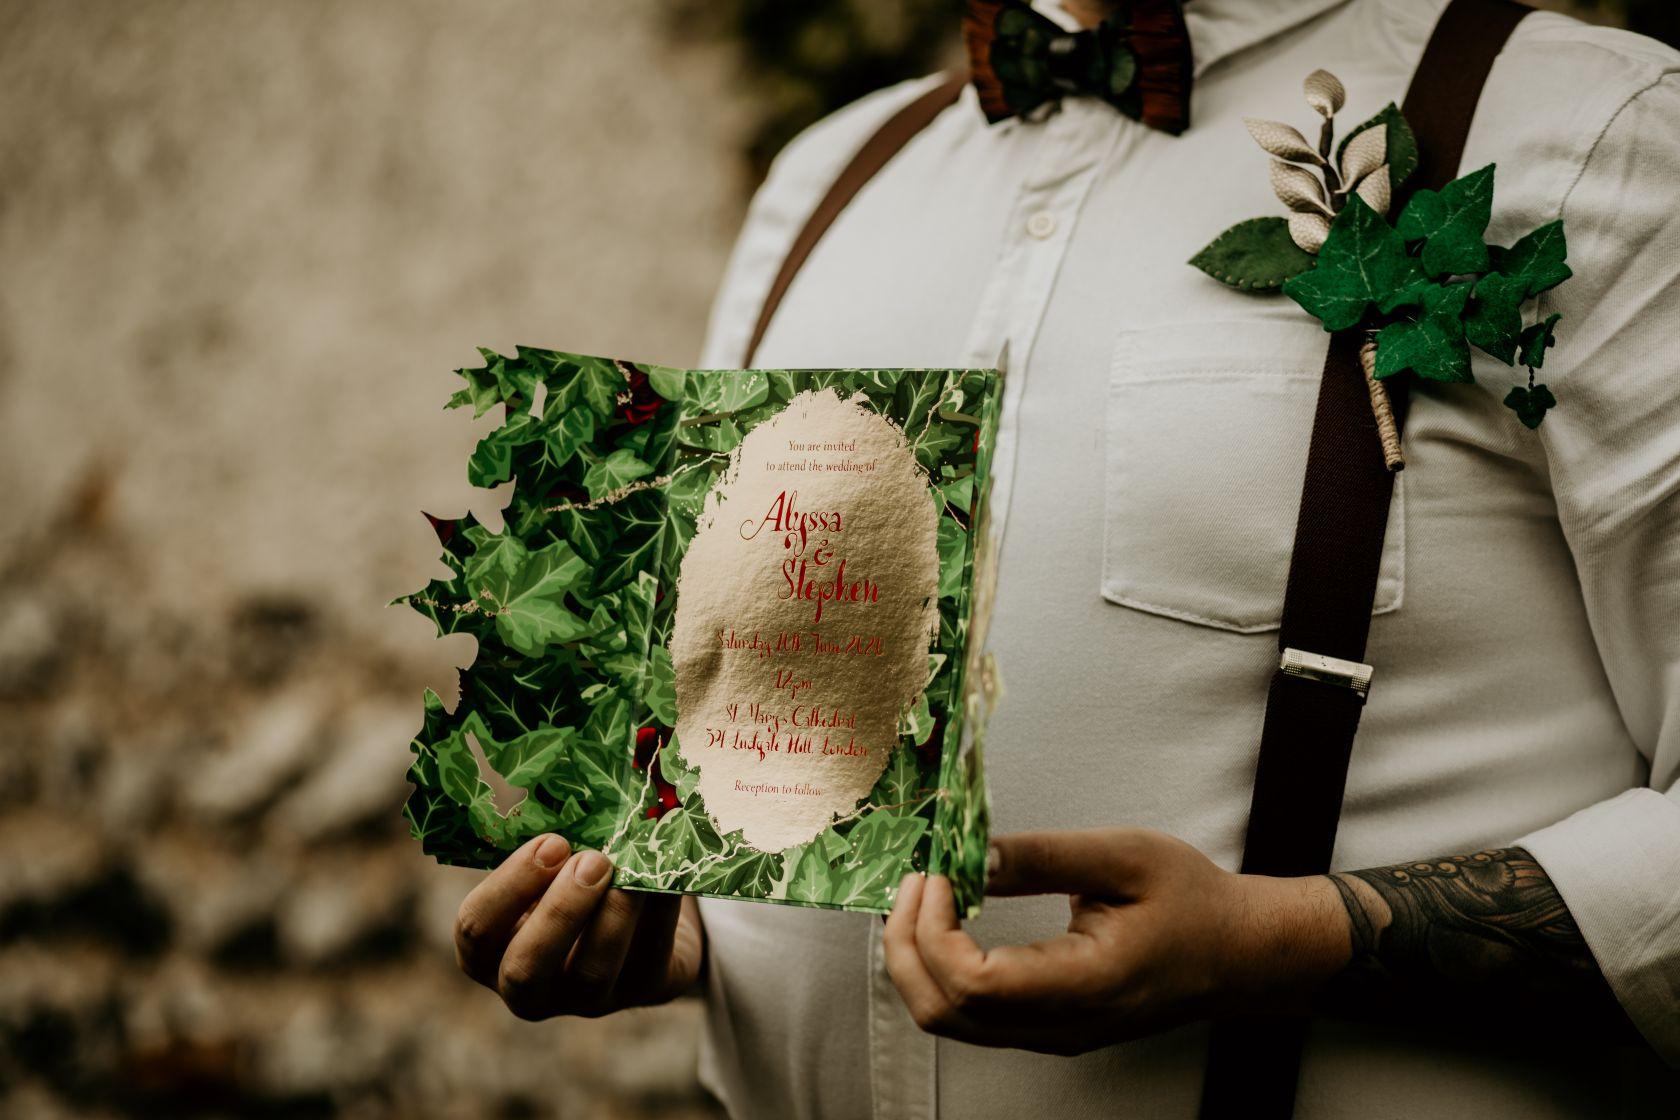 alternative fairytale wedding- snow white wedding- charlotte laurie designs-chloe mary photo- unconventional wedding- alternative wedding inspiration- fairytale wedding invitation- unique wedding stationery